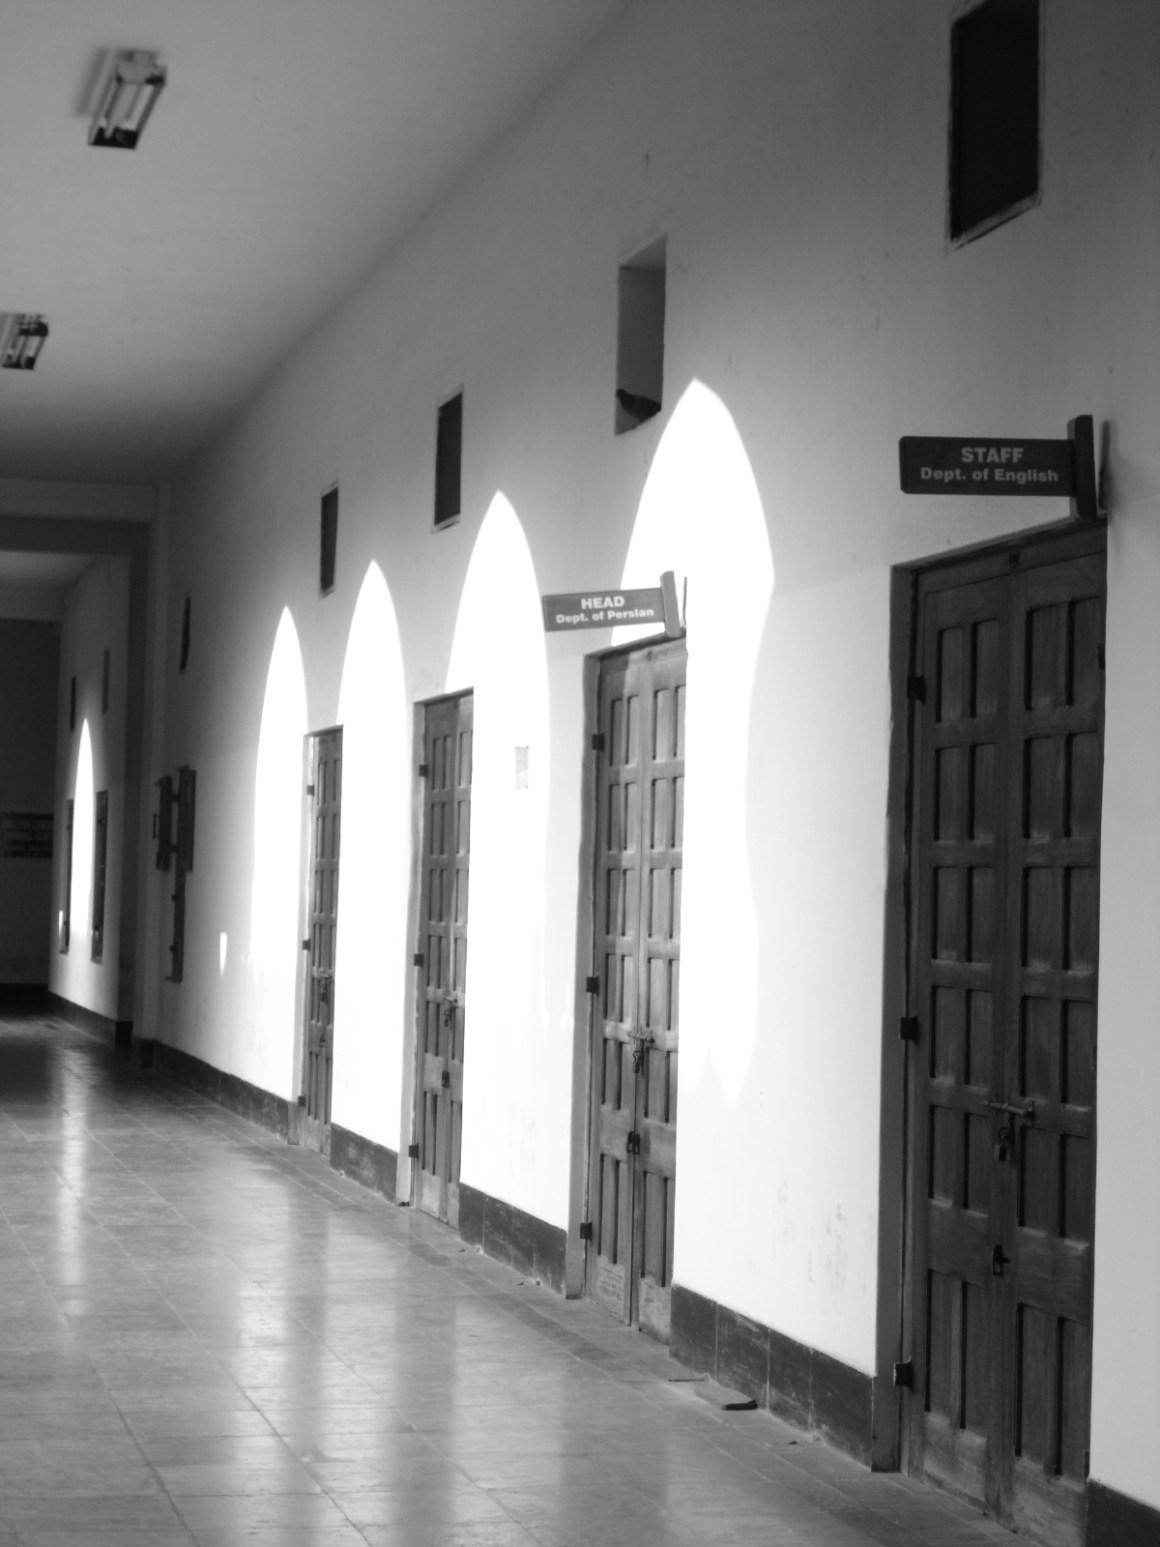 University  corridor. Credit: Jules Joseph, CC 2.0